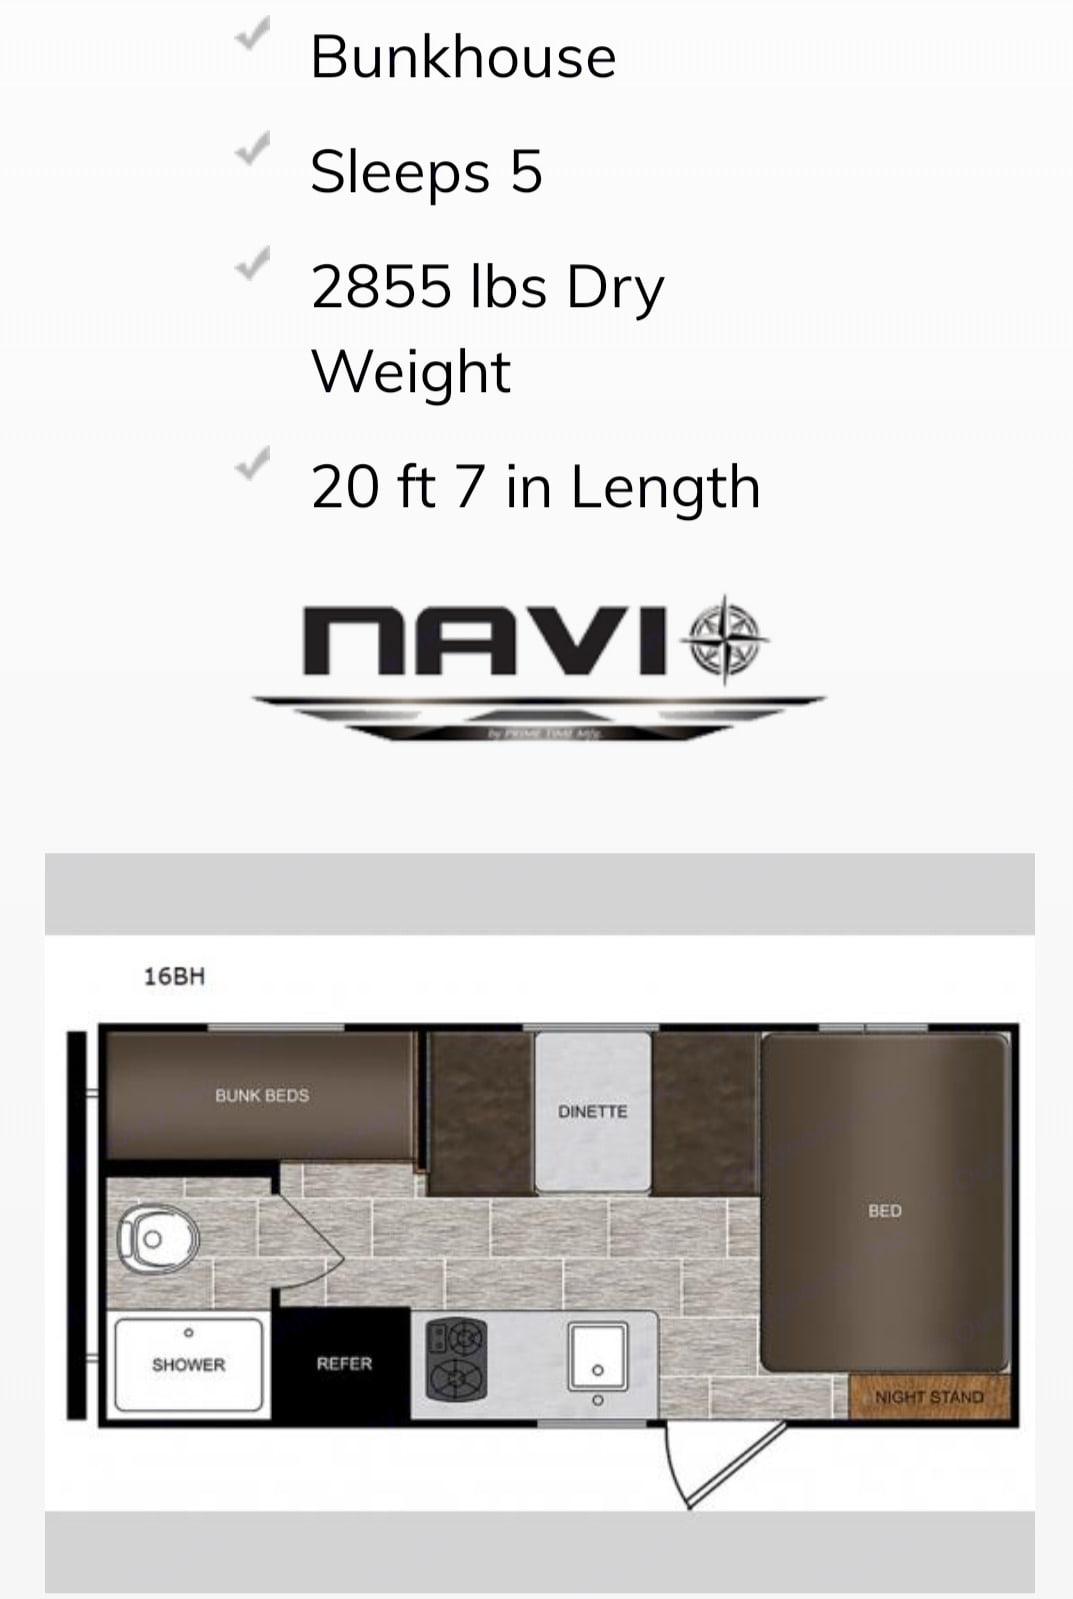 Floorplan. Forest River Navi 16Bh Prime 2019